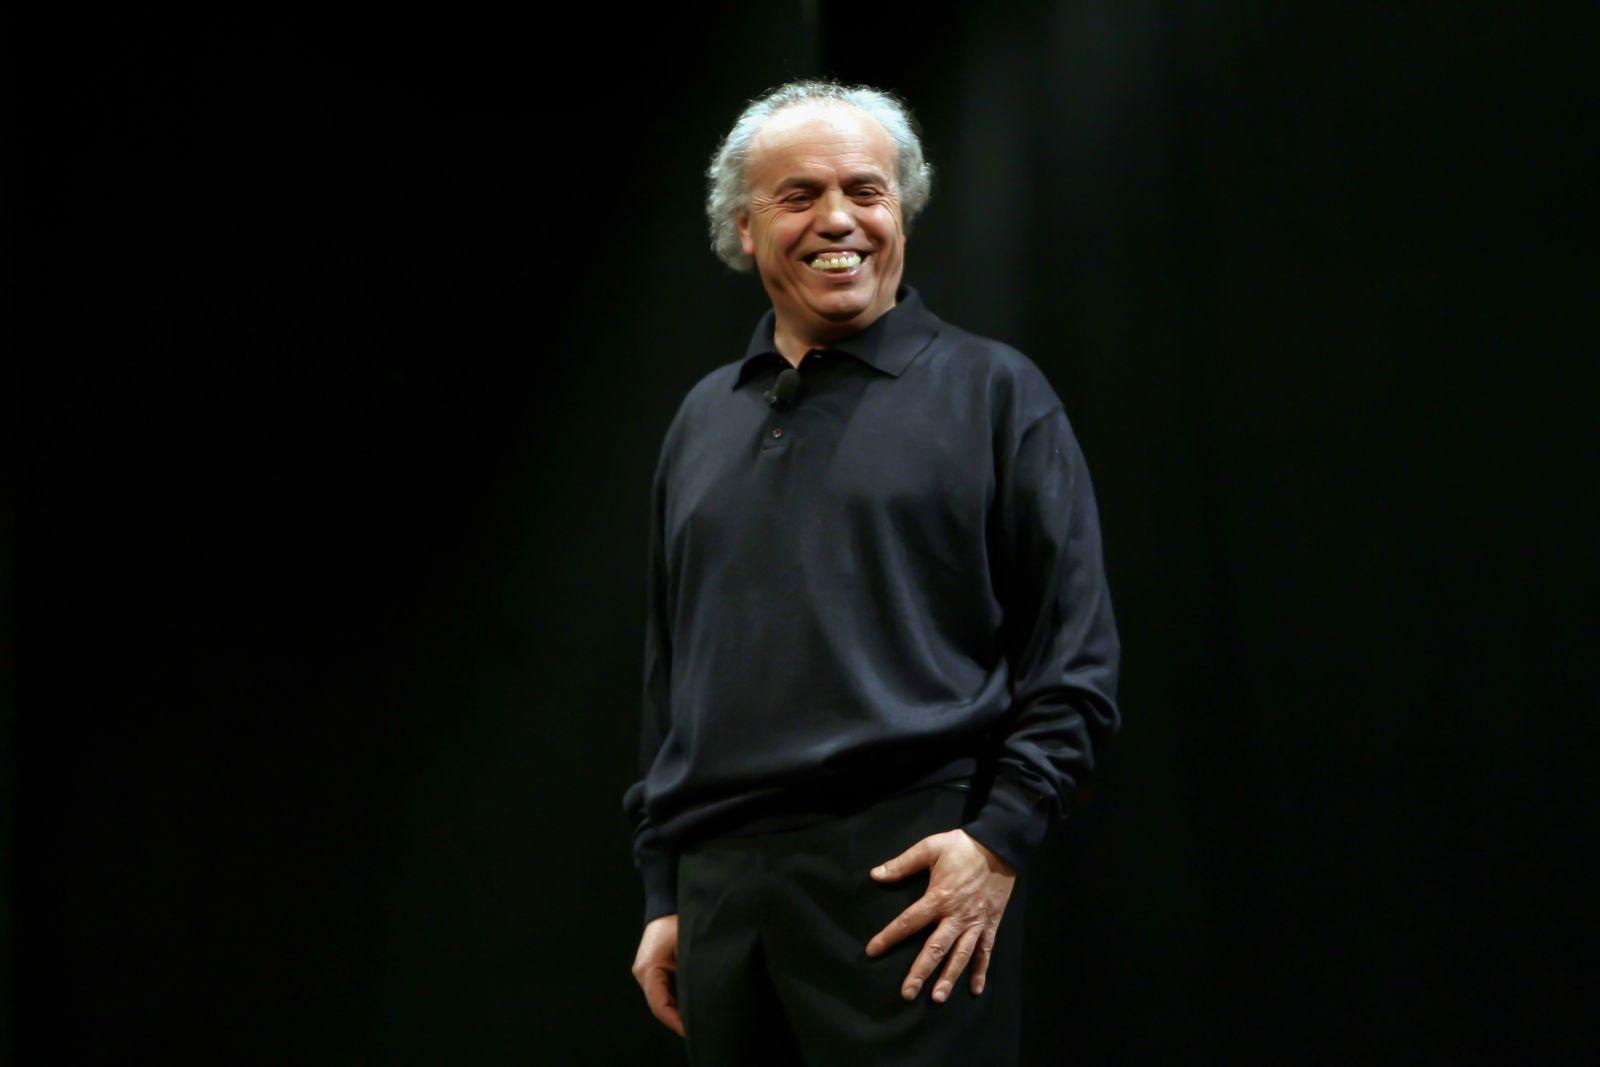 Johan Padan by Mario Pirovano - photo Fabio Pirazzi